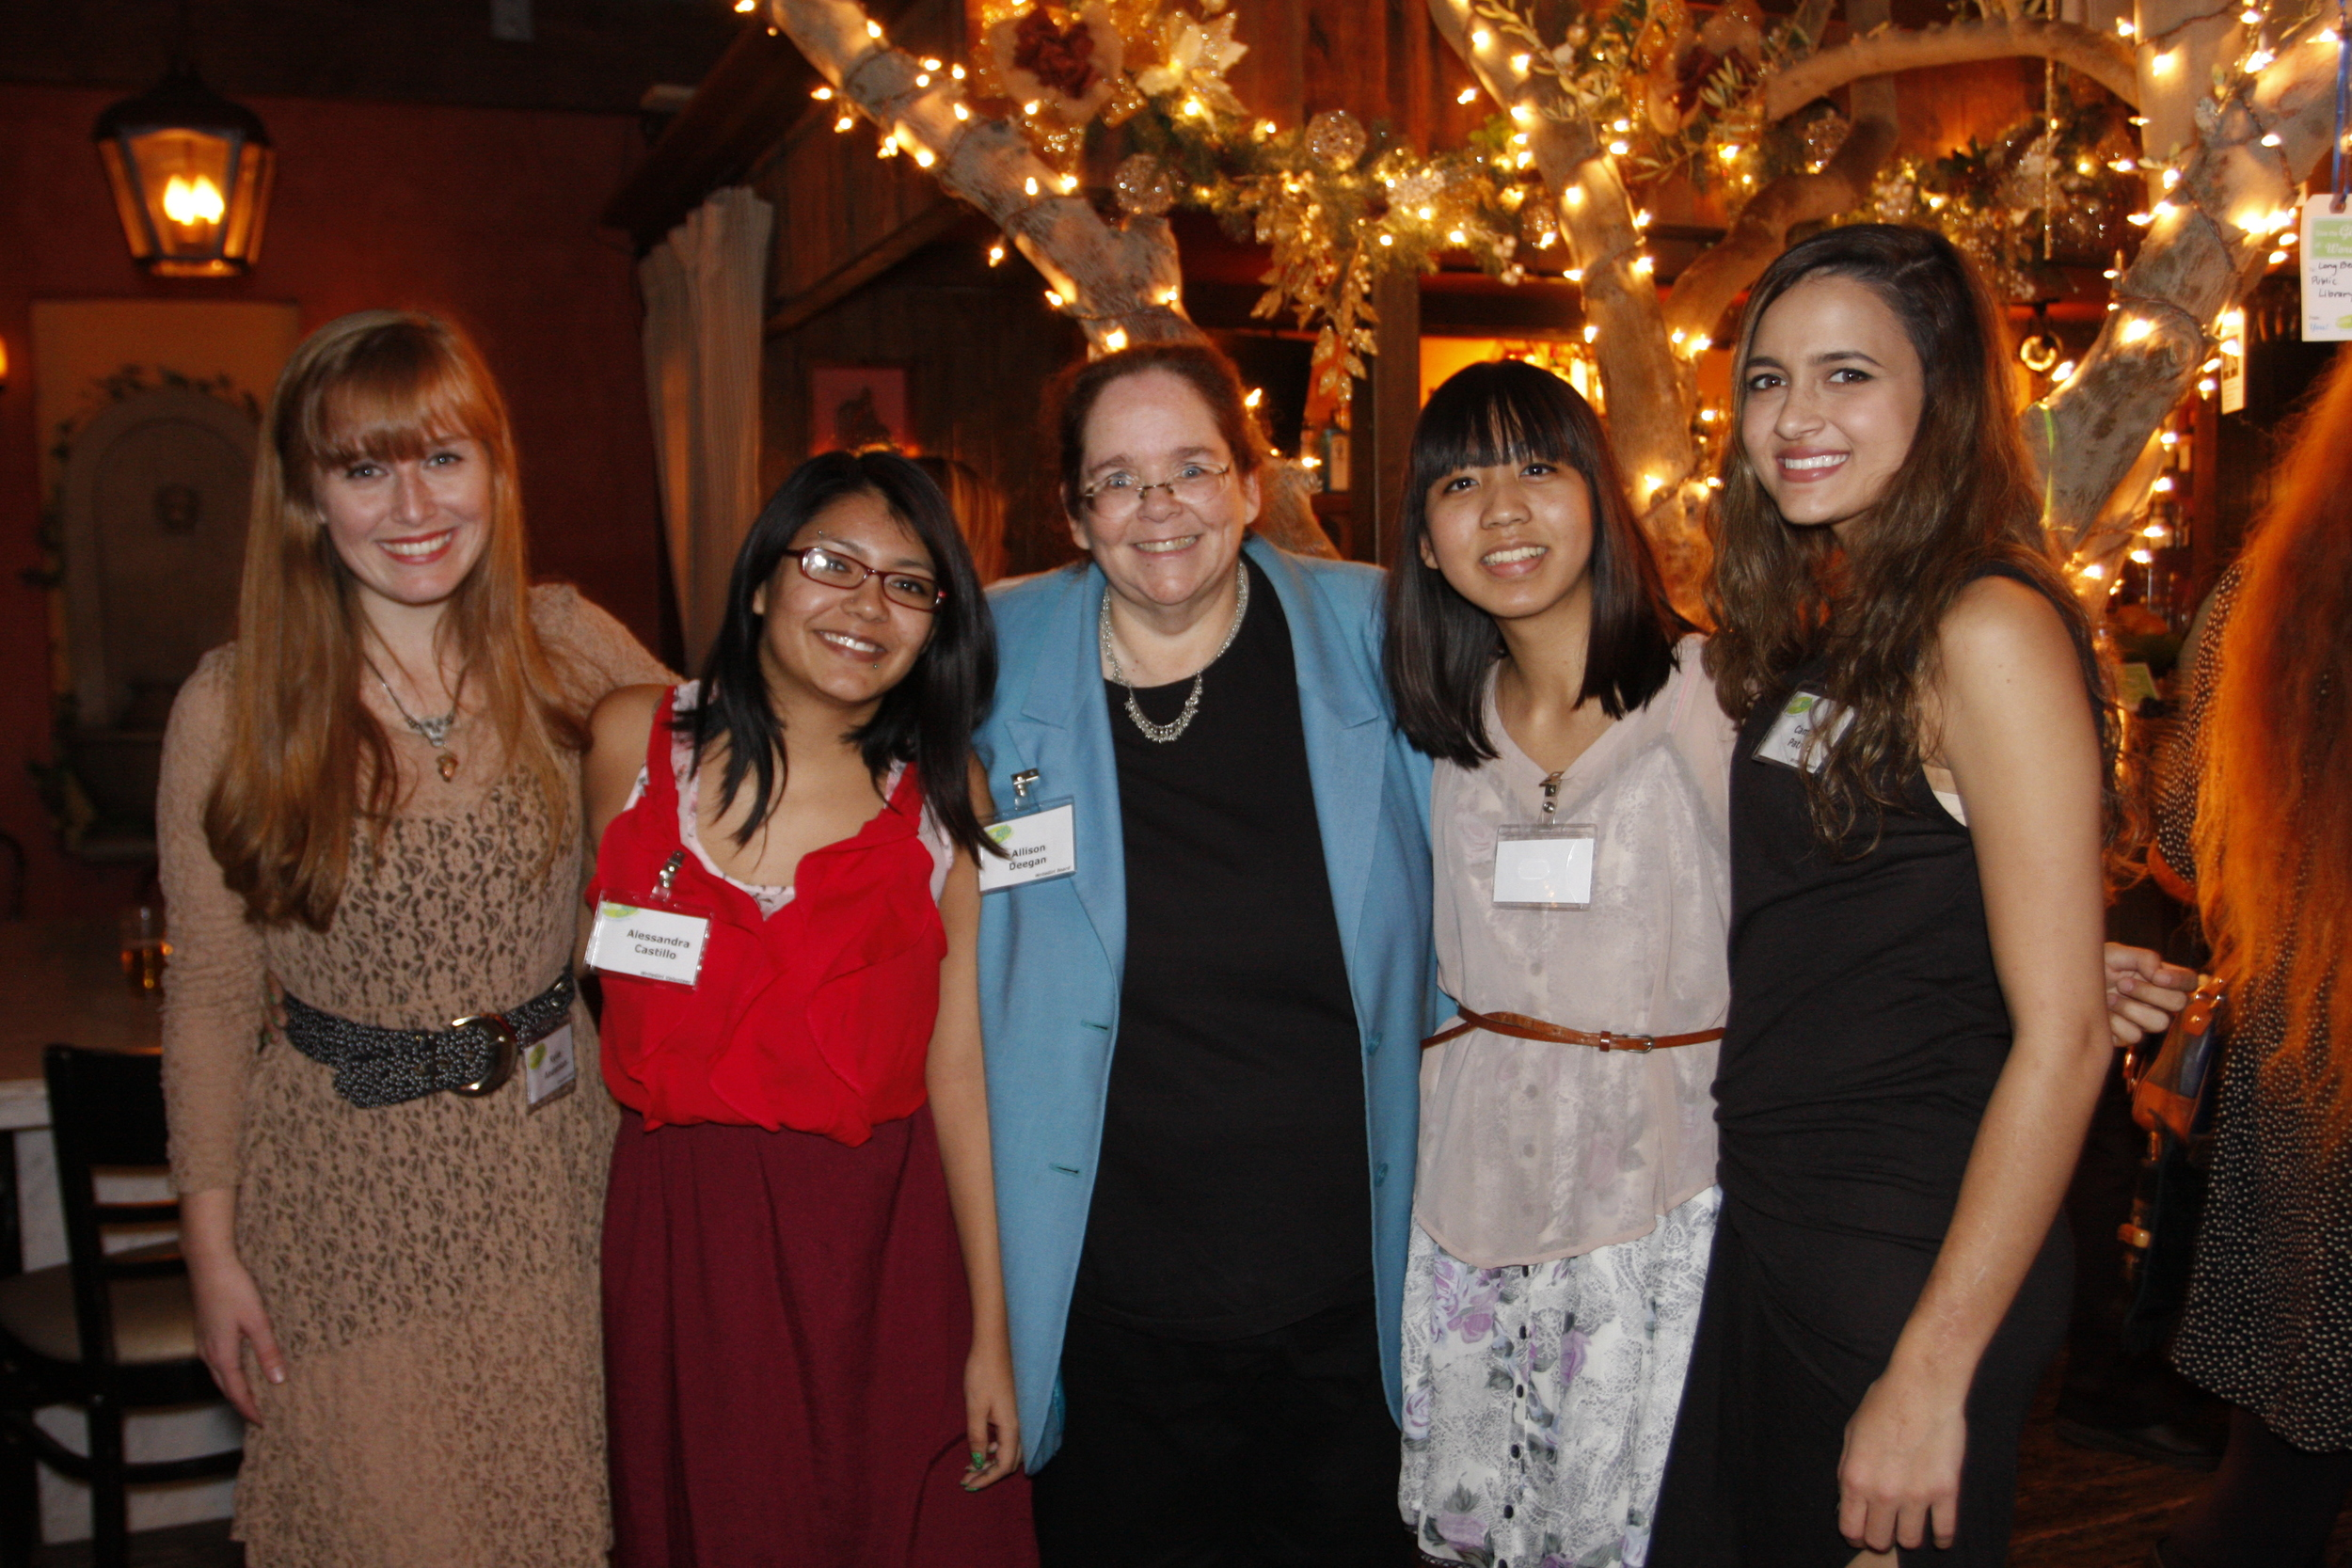 WriteGirl Associate Director Allison Deegan with current mentee Jackie Uy, and alumni mentees Kylie Anderson, Alejandra Castillo, and Camille Patrao.